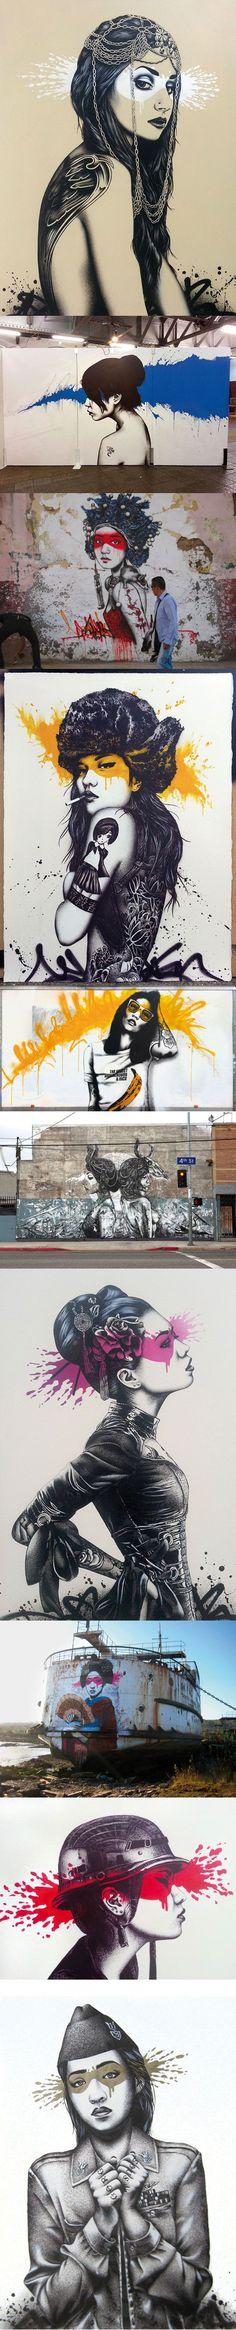 Artist: Findac #streetart